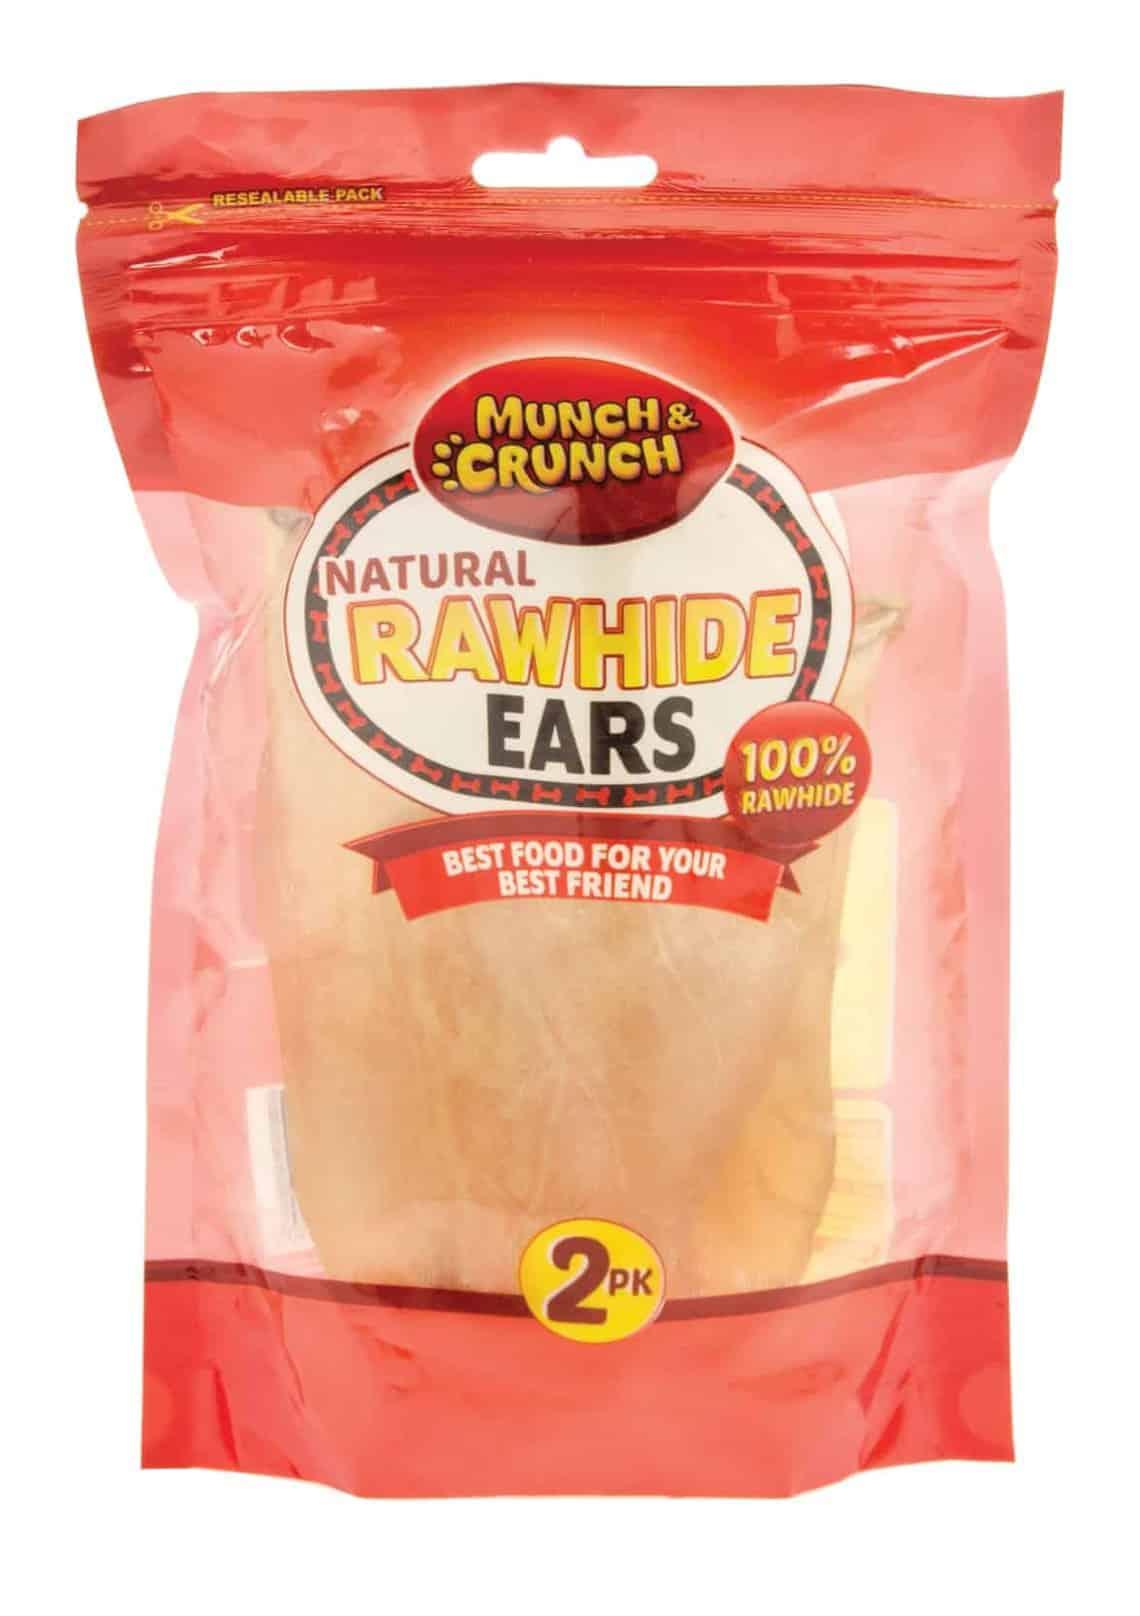 Munch Crunch Rawhide Ears - 2Pk Natural